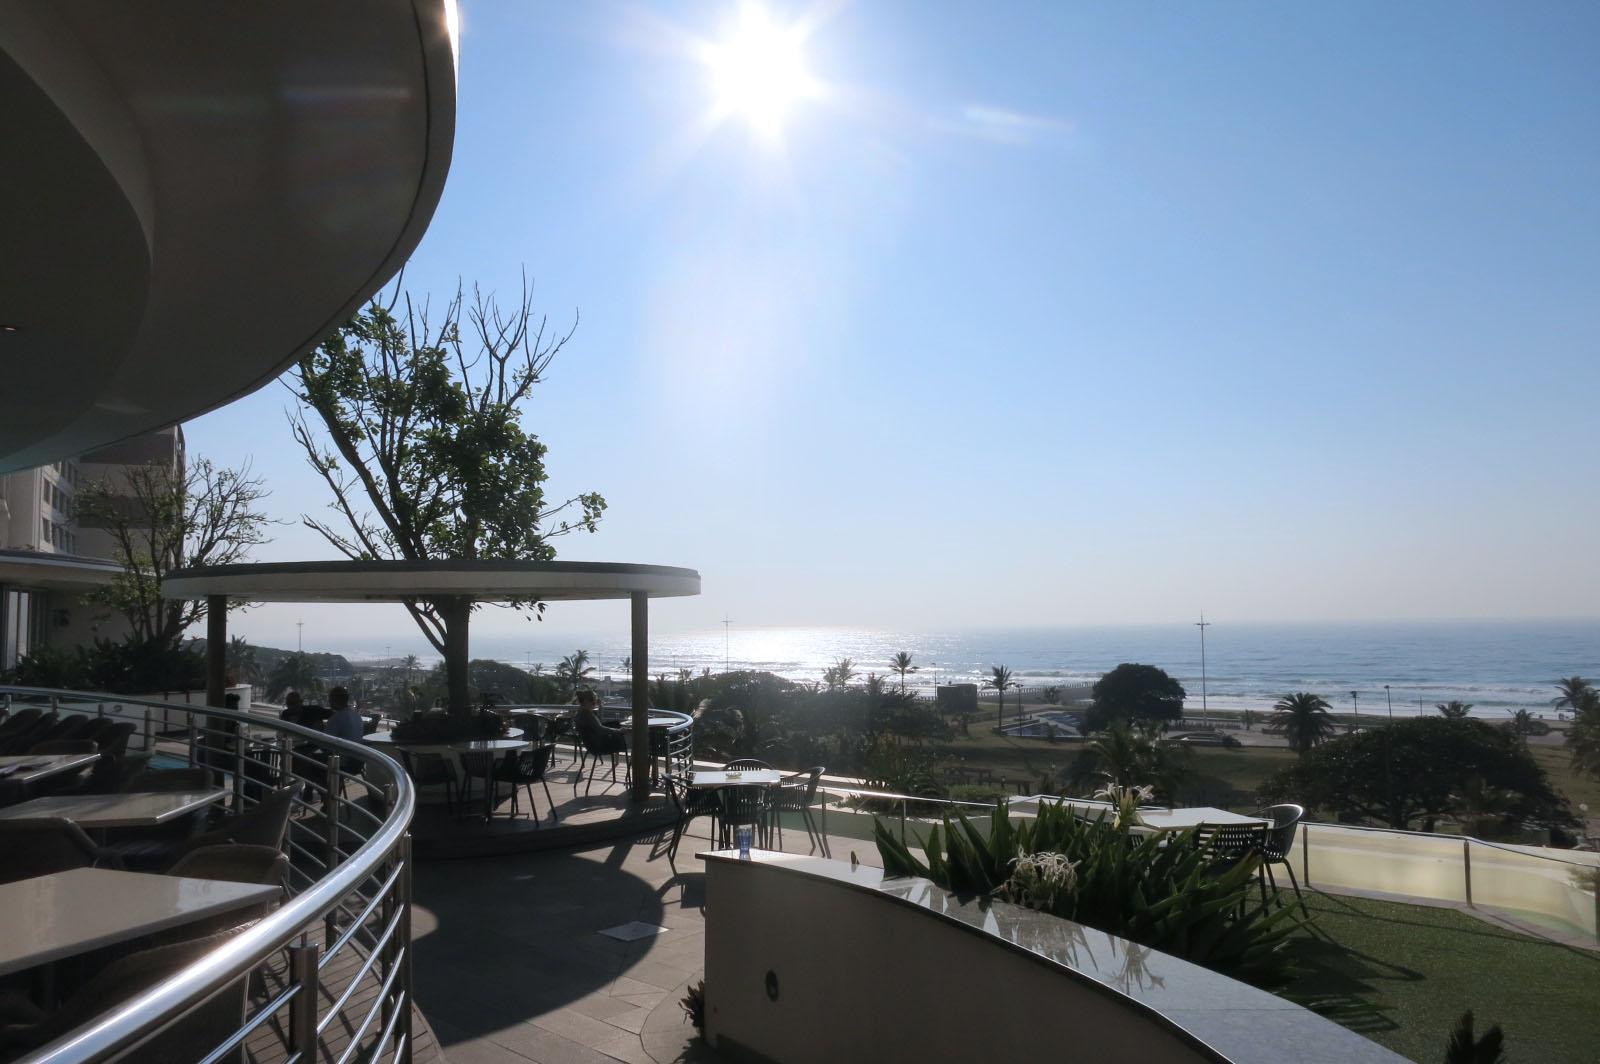 Southern Sun Elangeni View